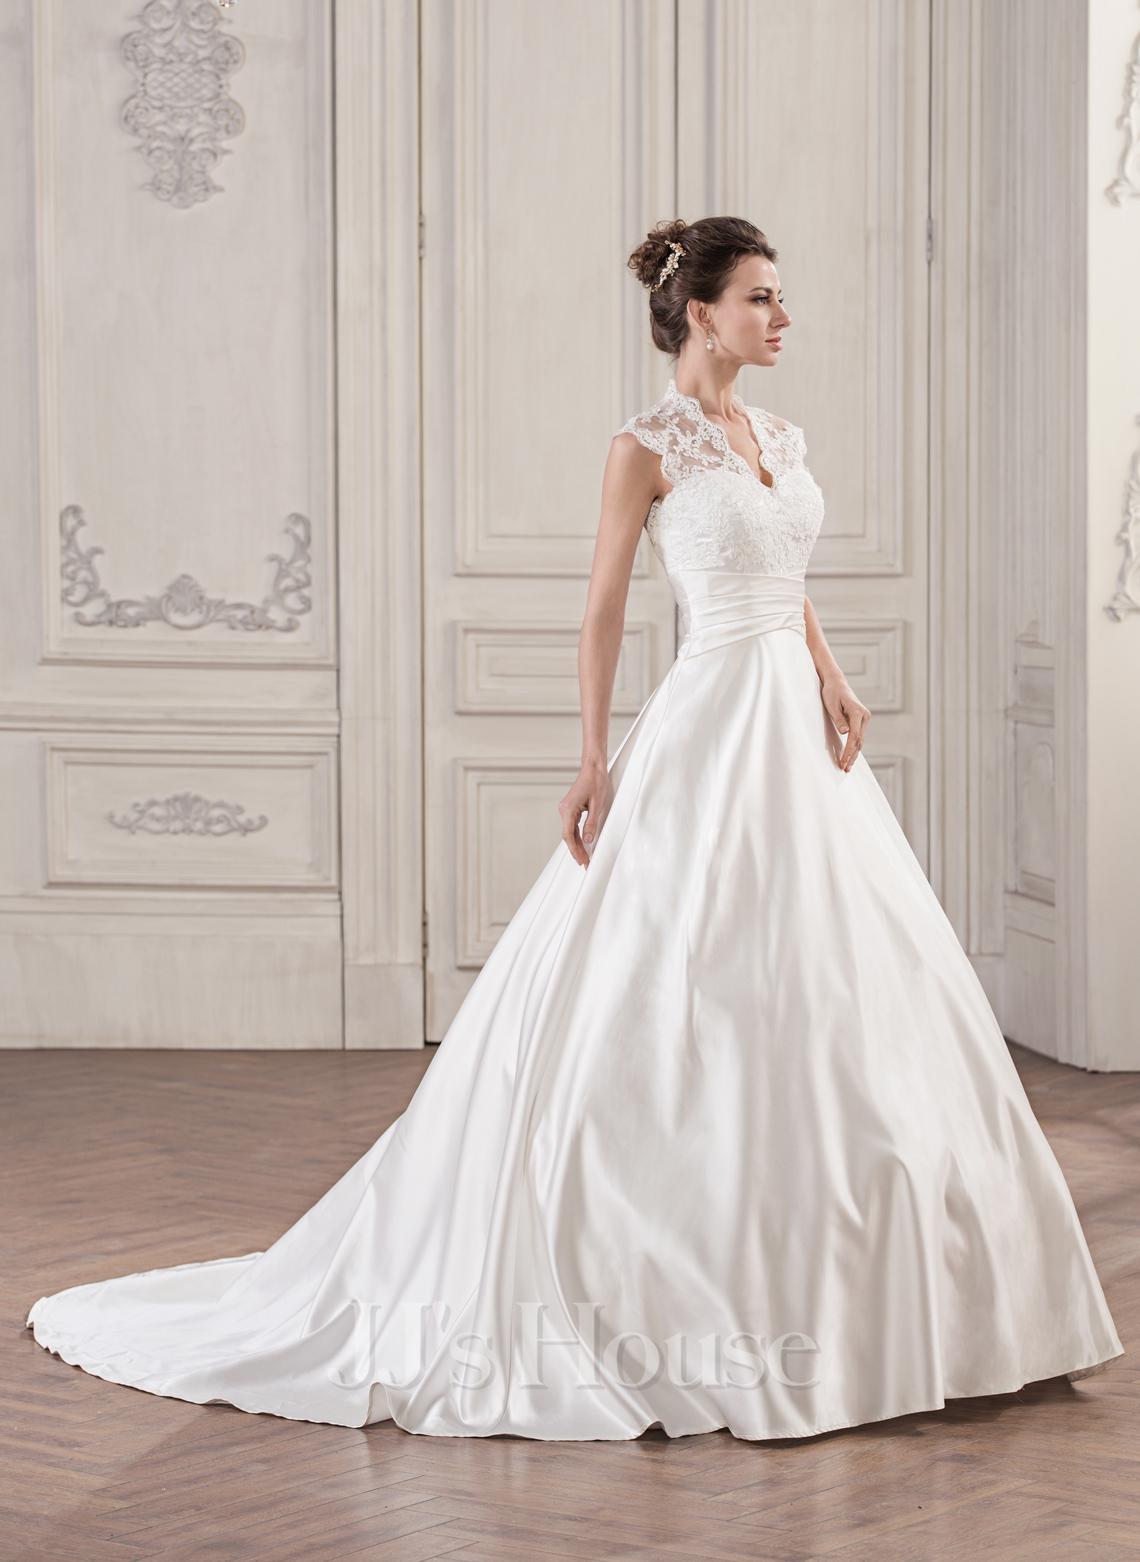 Ball Gown V Neck Court Train Satin Lace Wedding Dress With Ruffle g jjshouse wedding dress Home Wedding Dresses Loading zoom